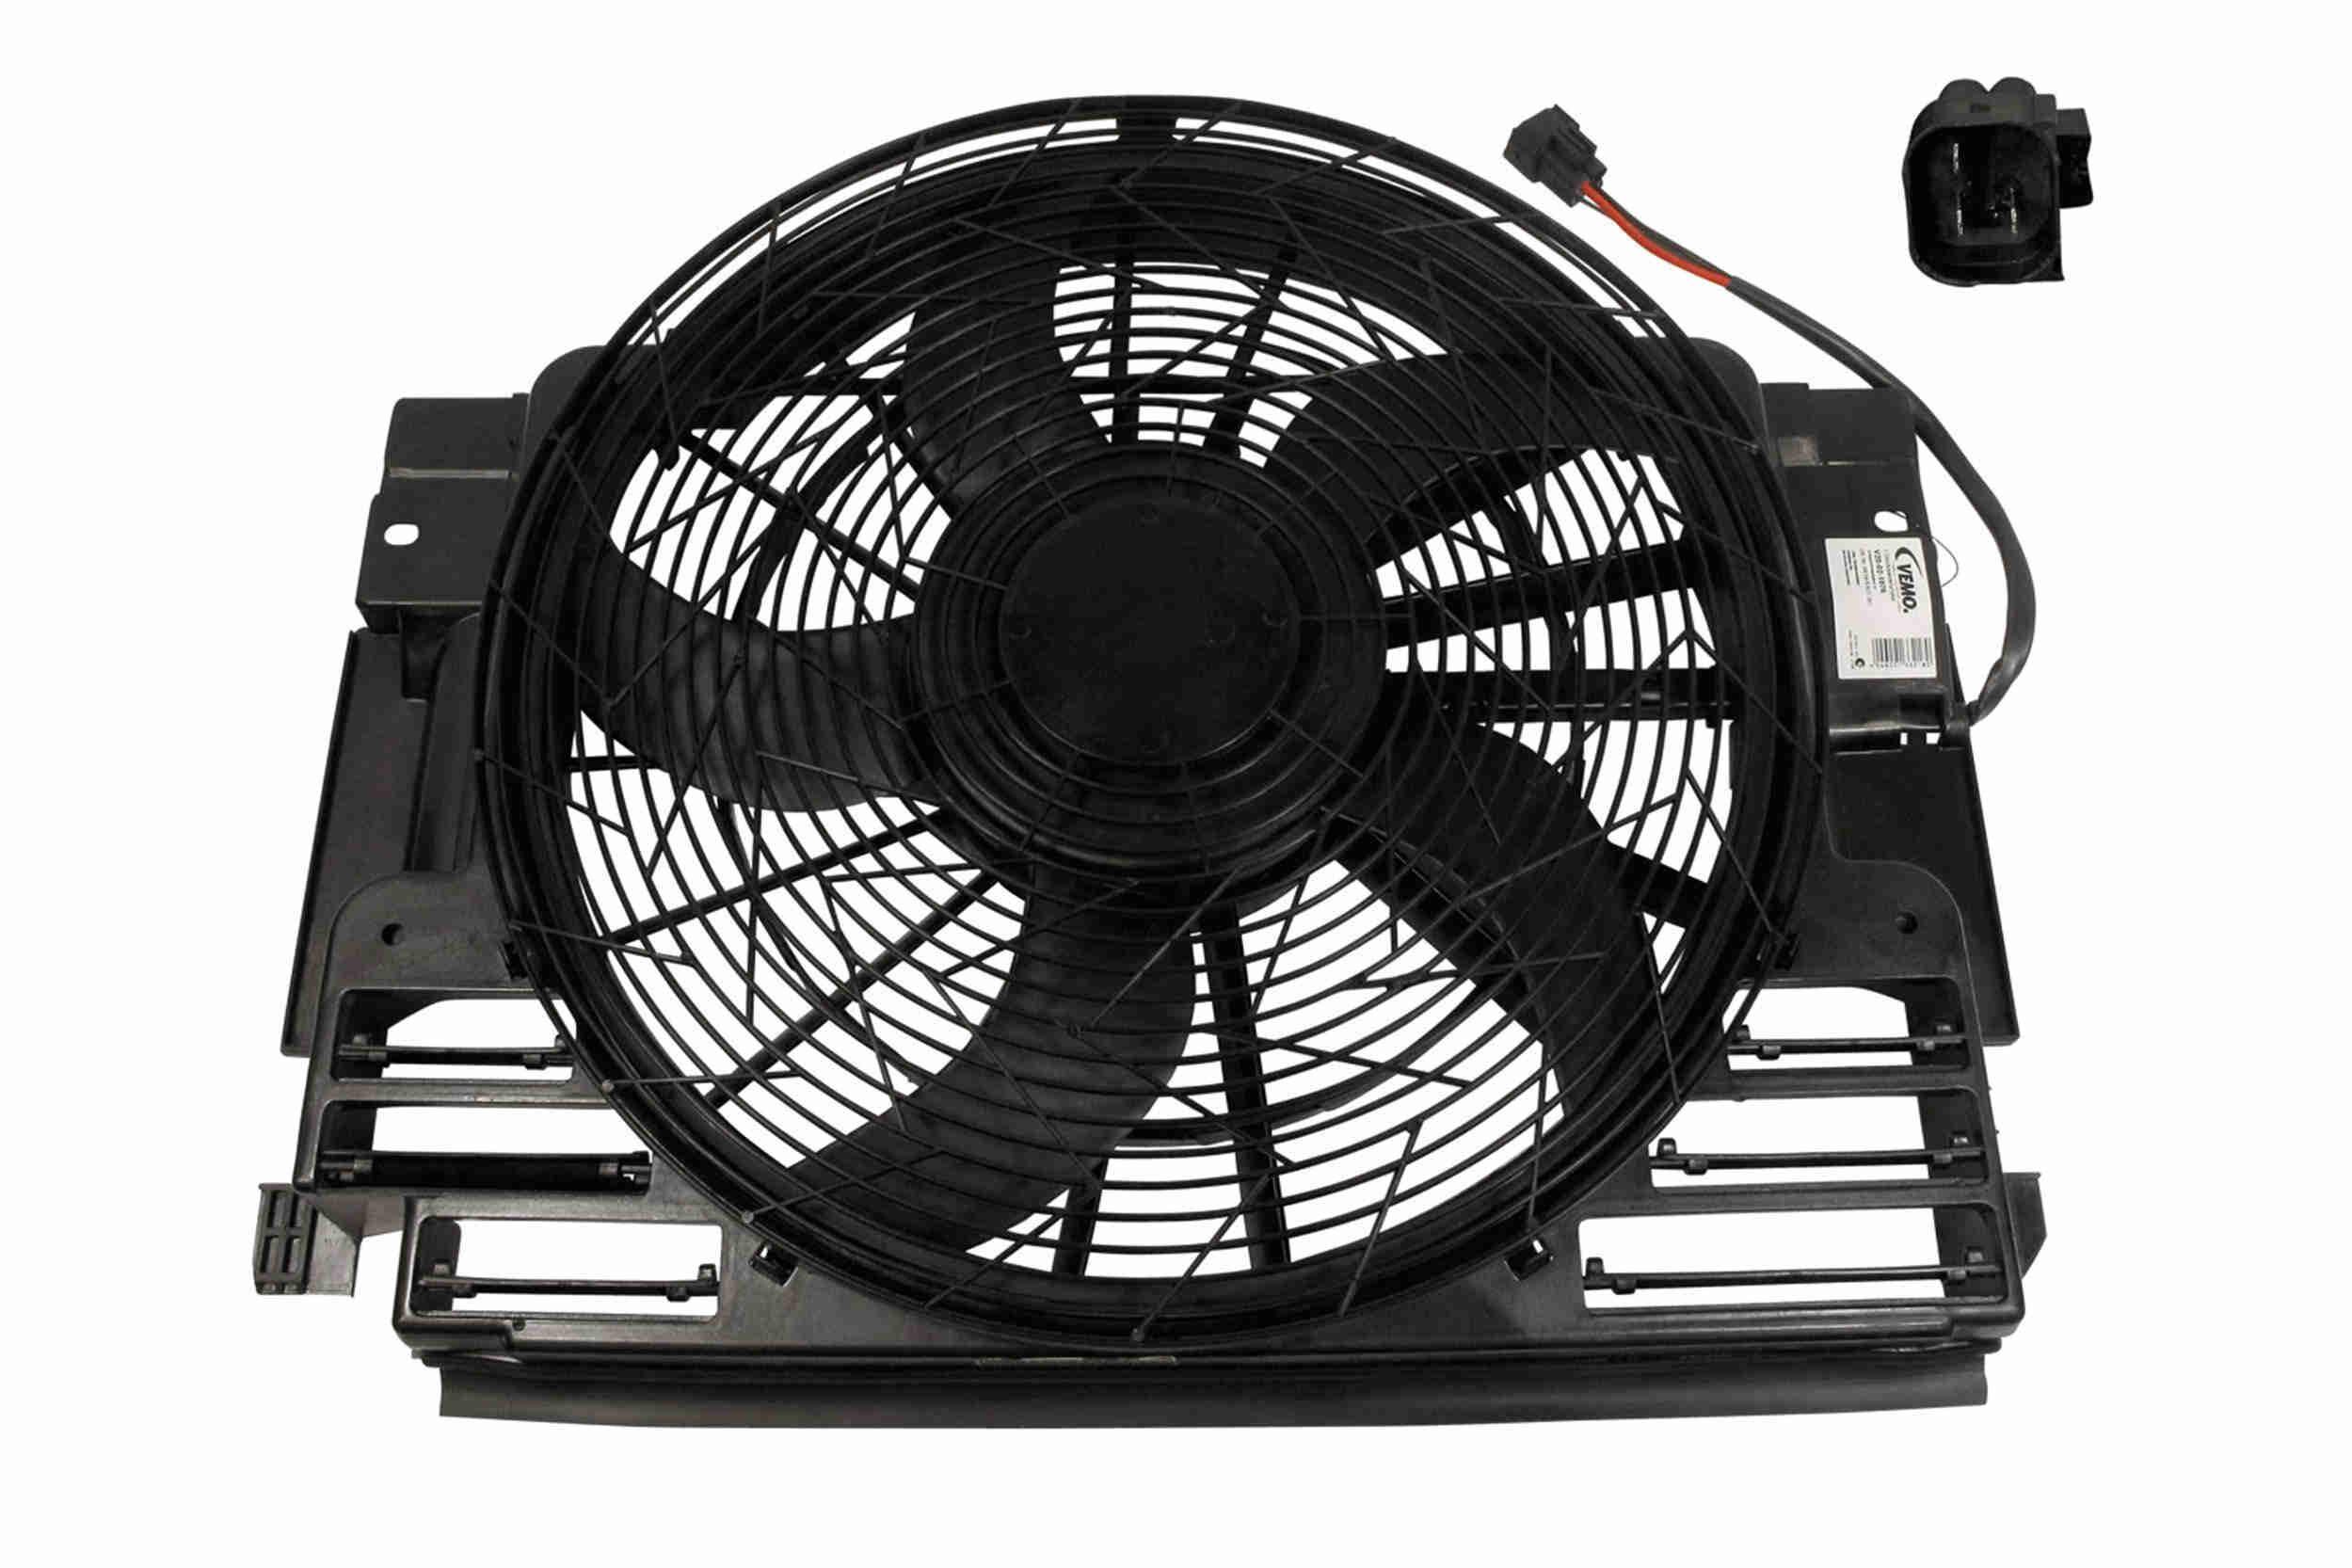 V20-02-1076 VEMO Lüfter, Klimakondensator V20-02-1076 günstig kaufen